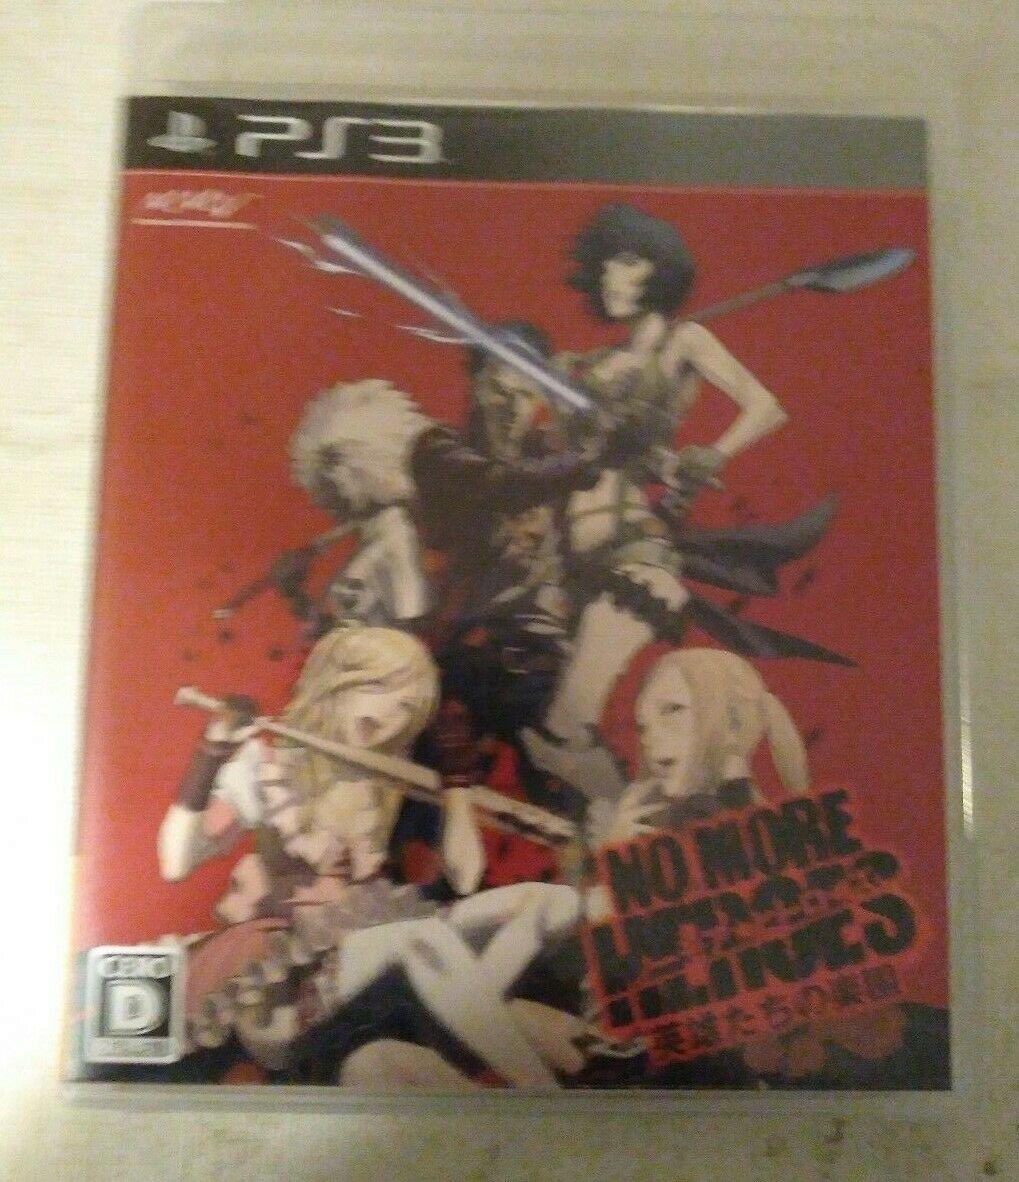 No More Heroes: Eiyuutachi no Rakuen (Sony PlayStation 3 2010) Japan Import PS3